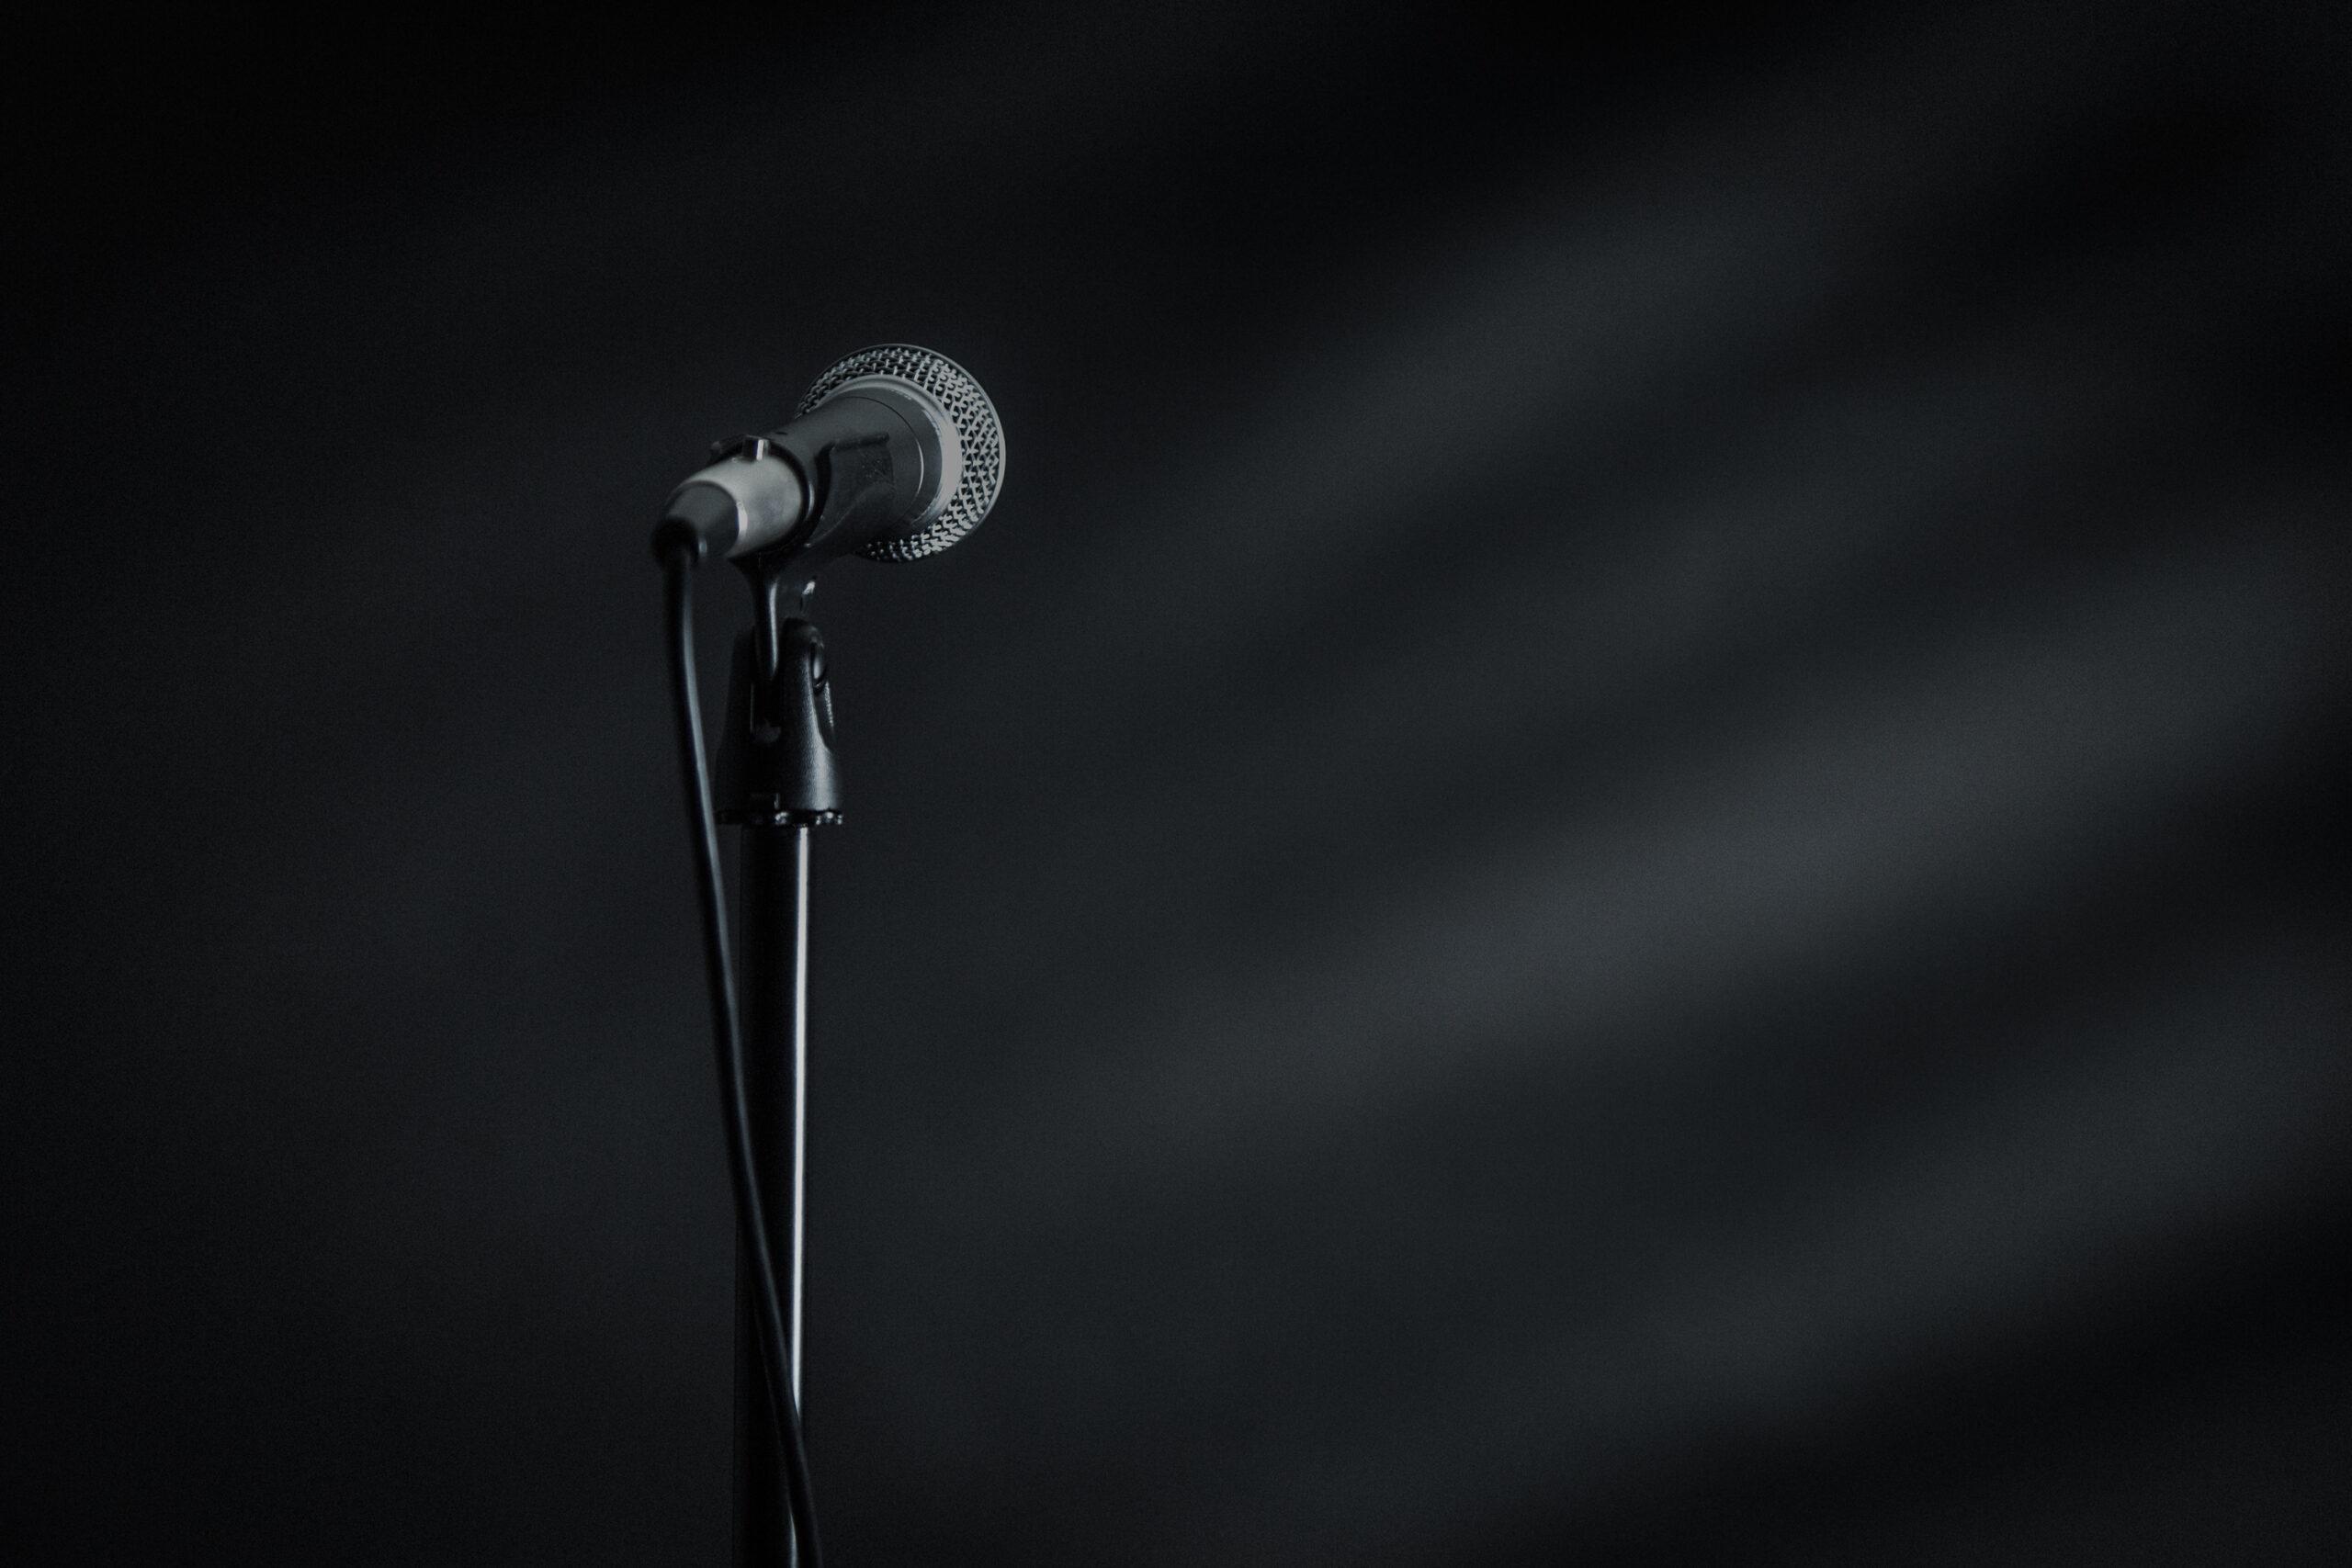 Microfono_rayado-2